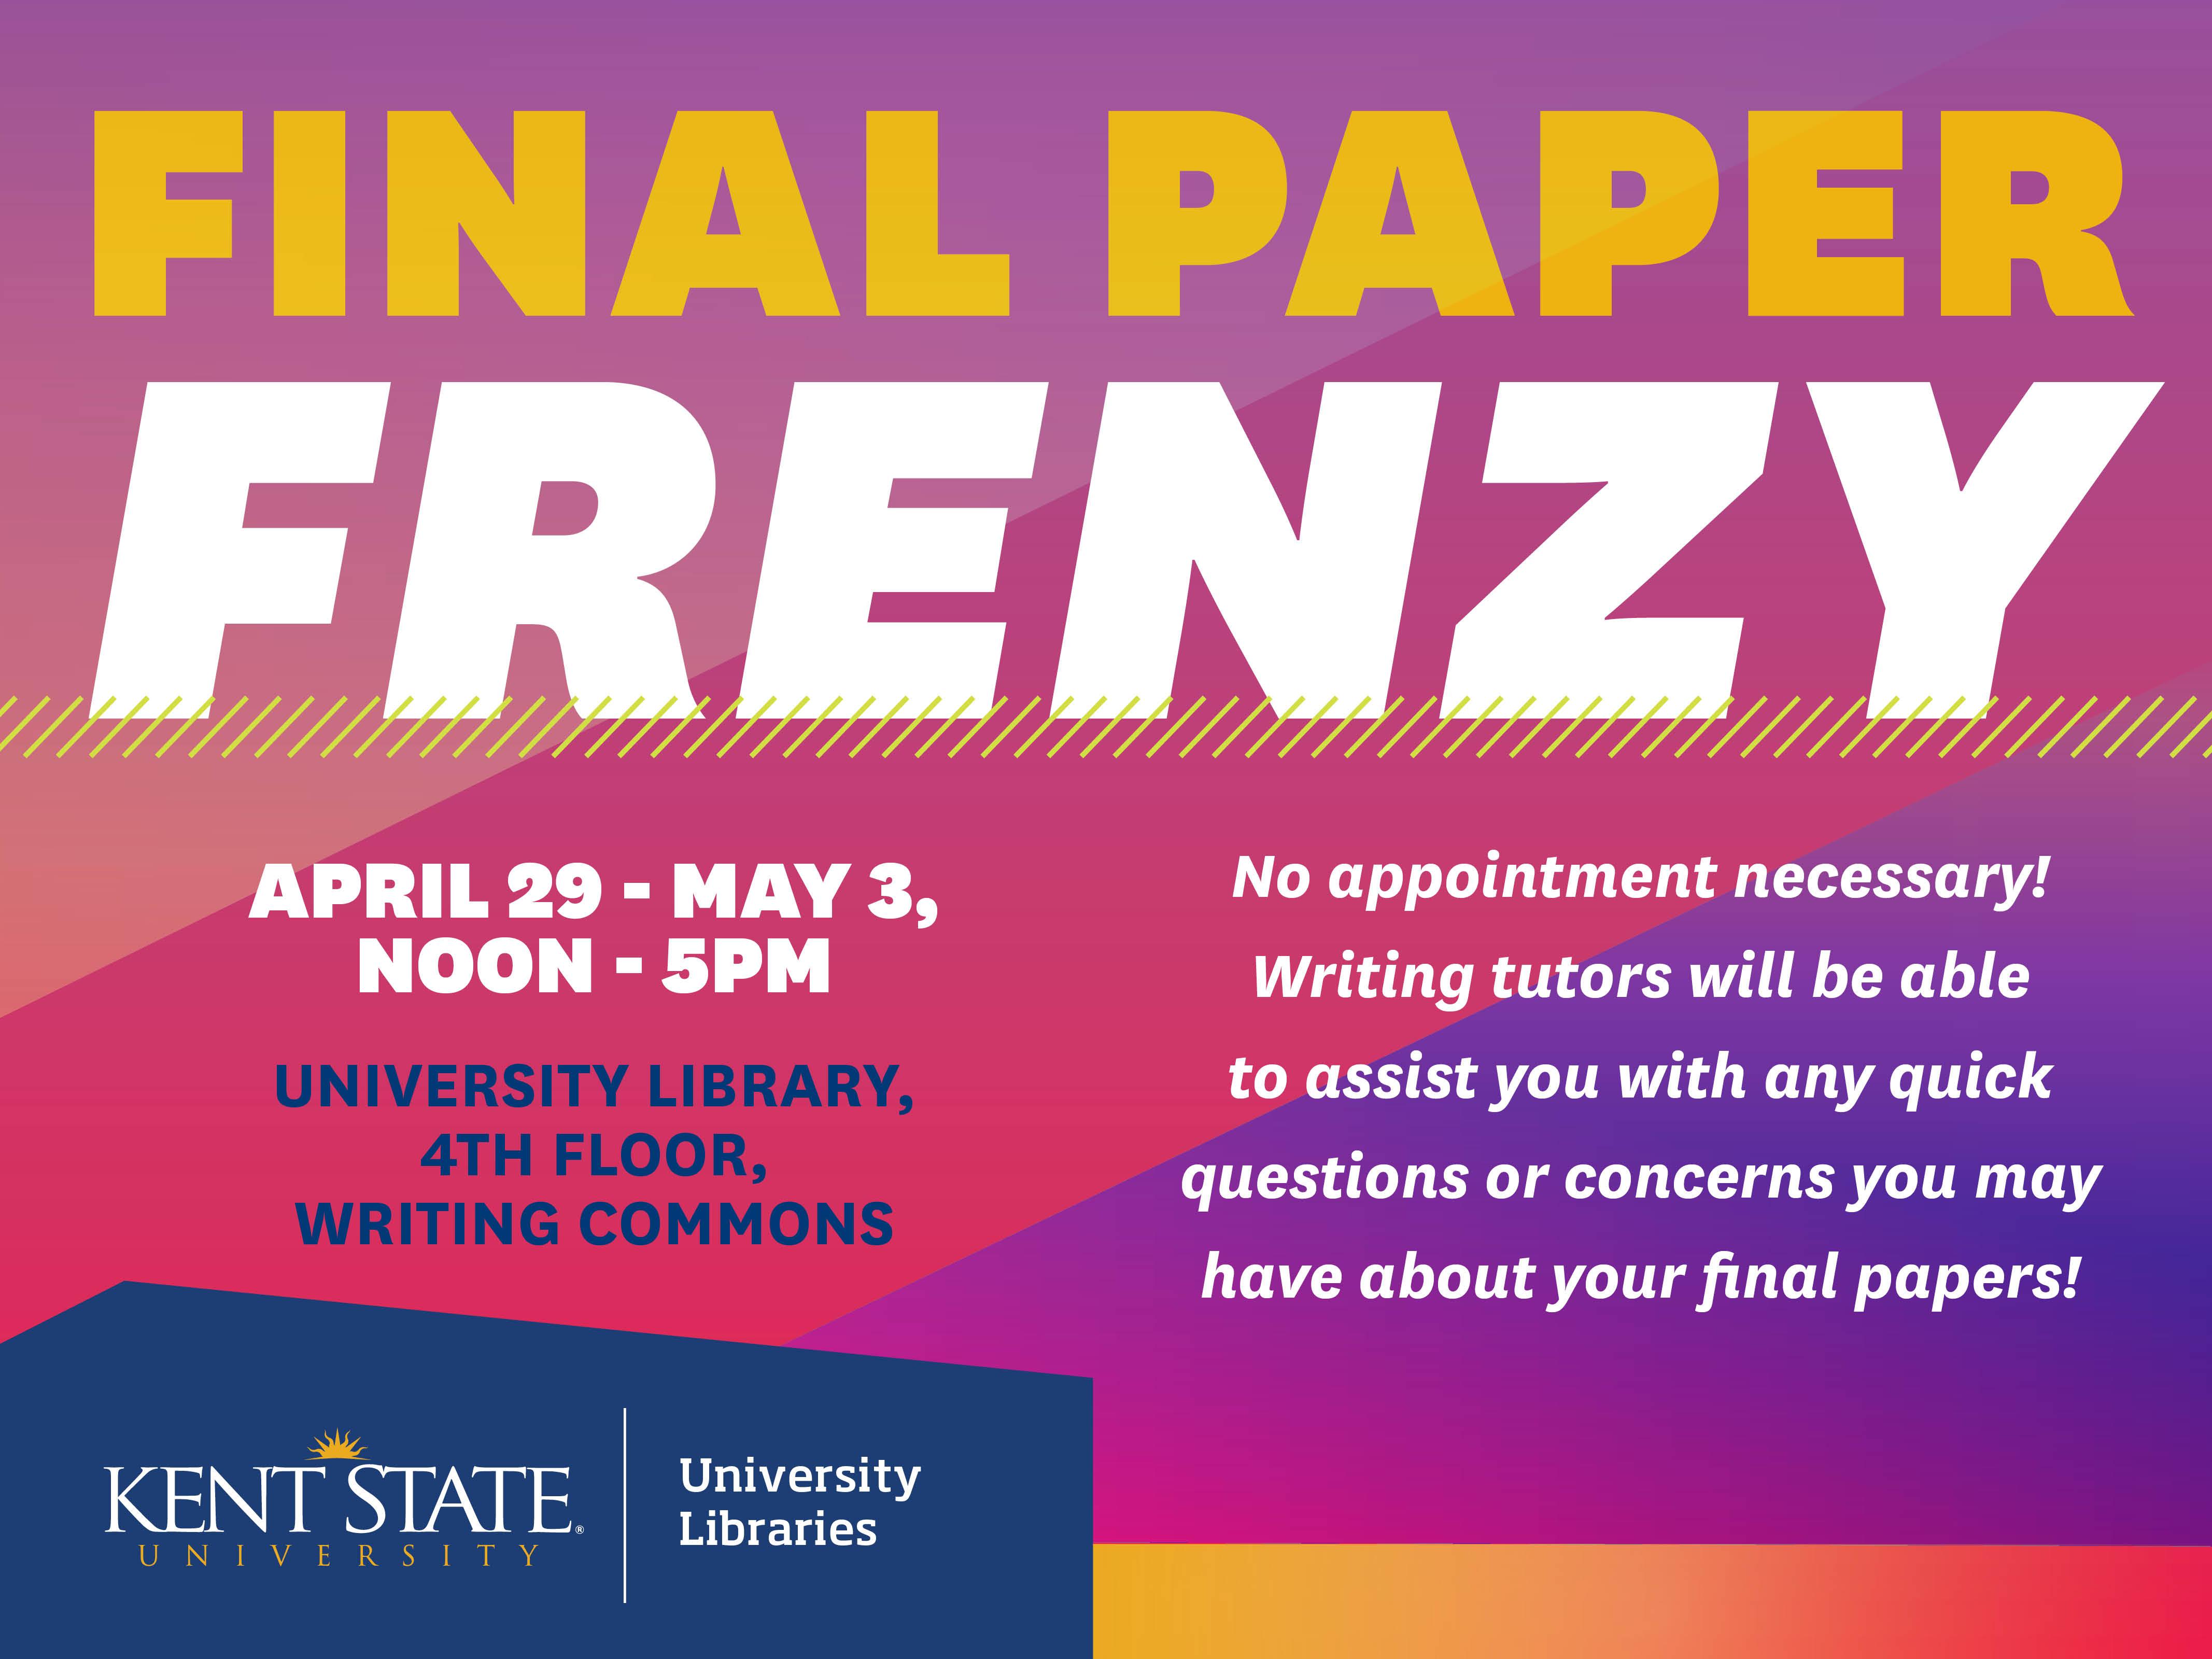 Final Paper Frenzy Flyer